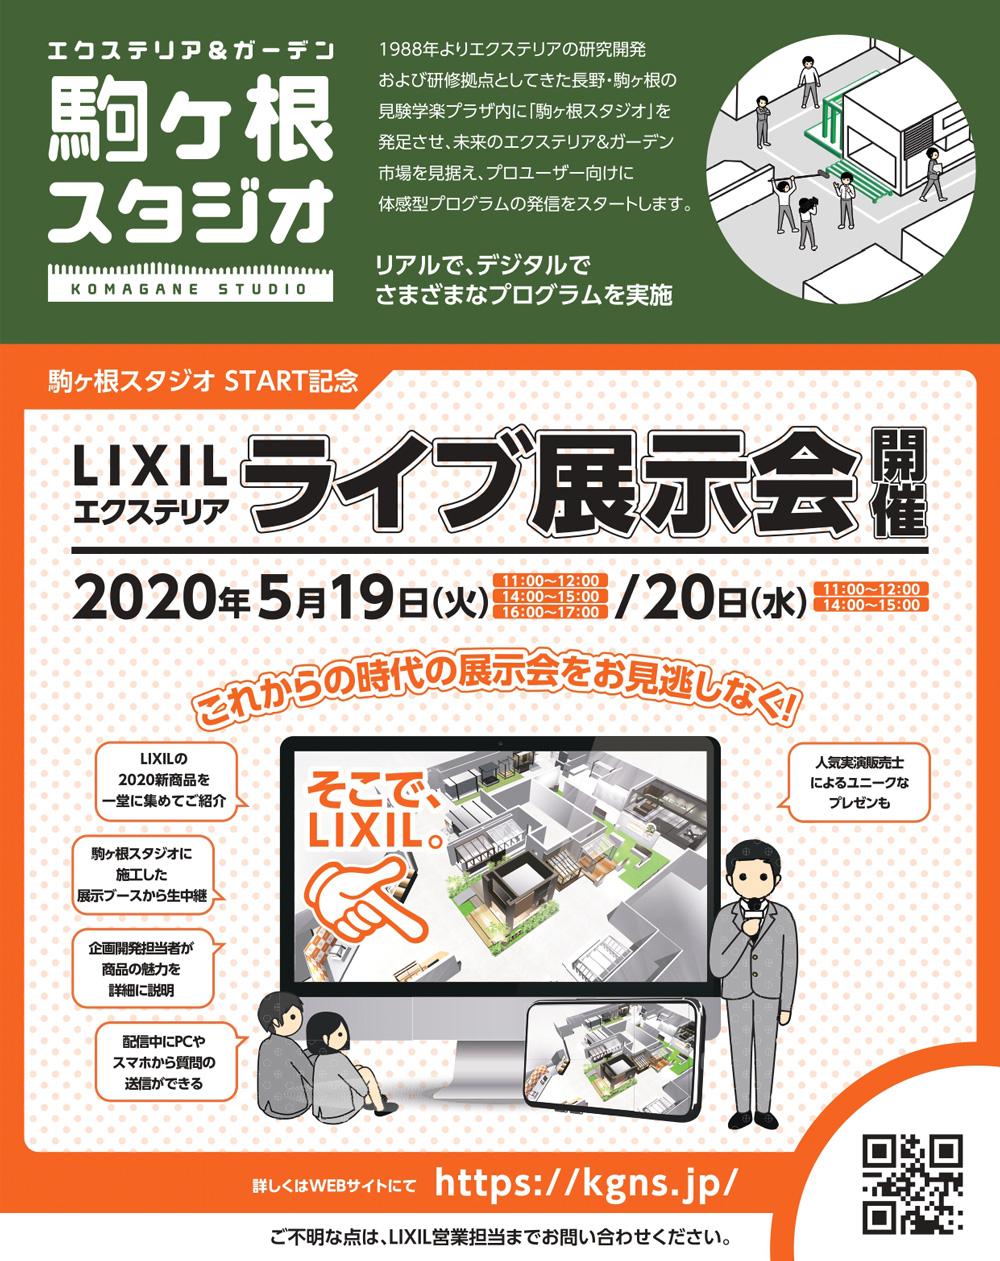 LIXIL駒ヶ根スタジオ